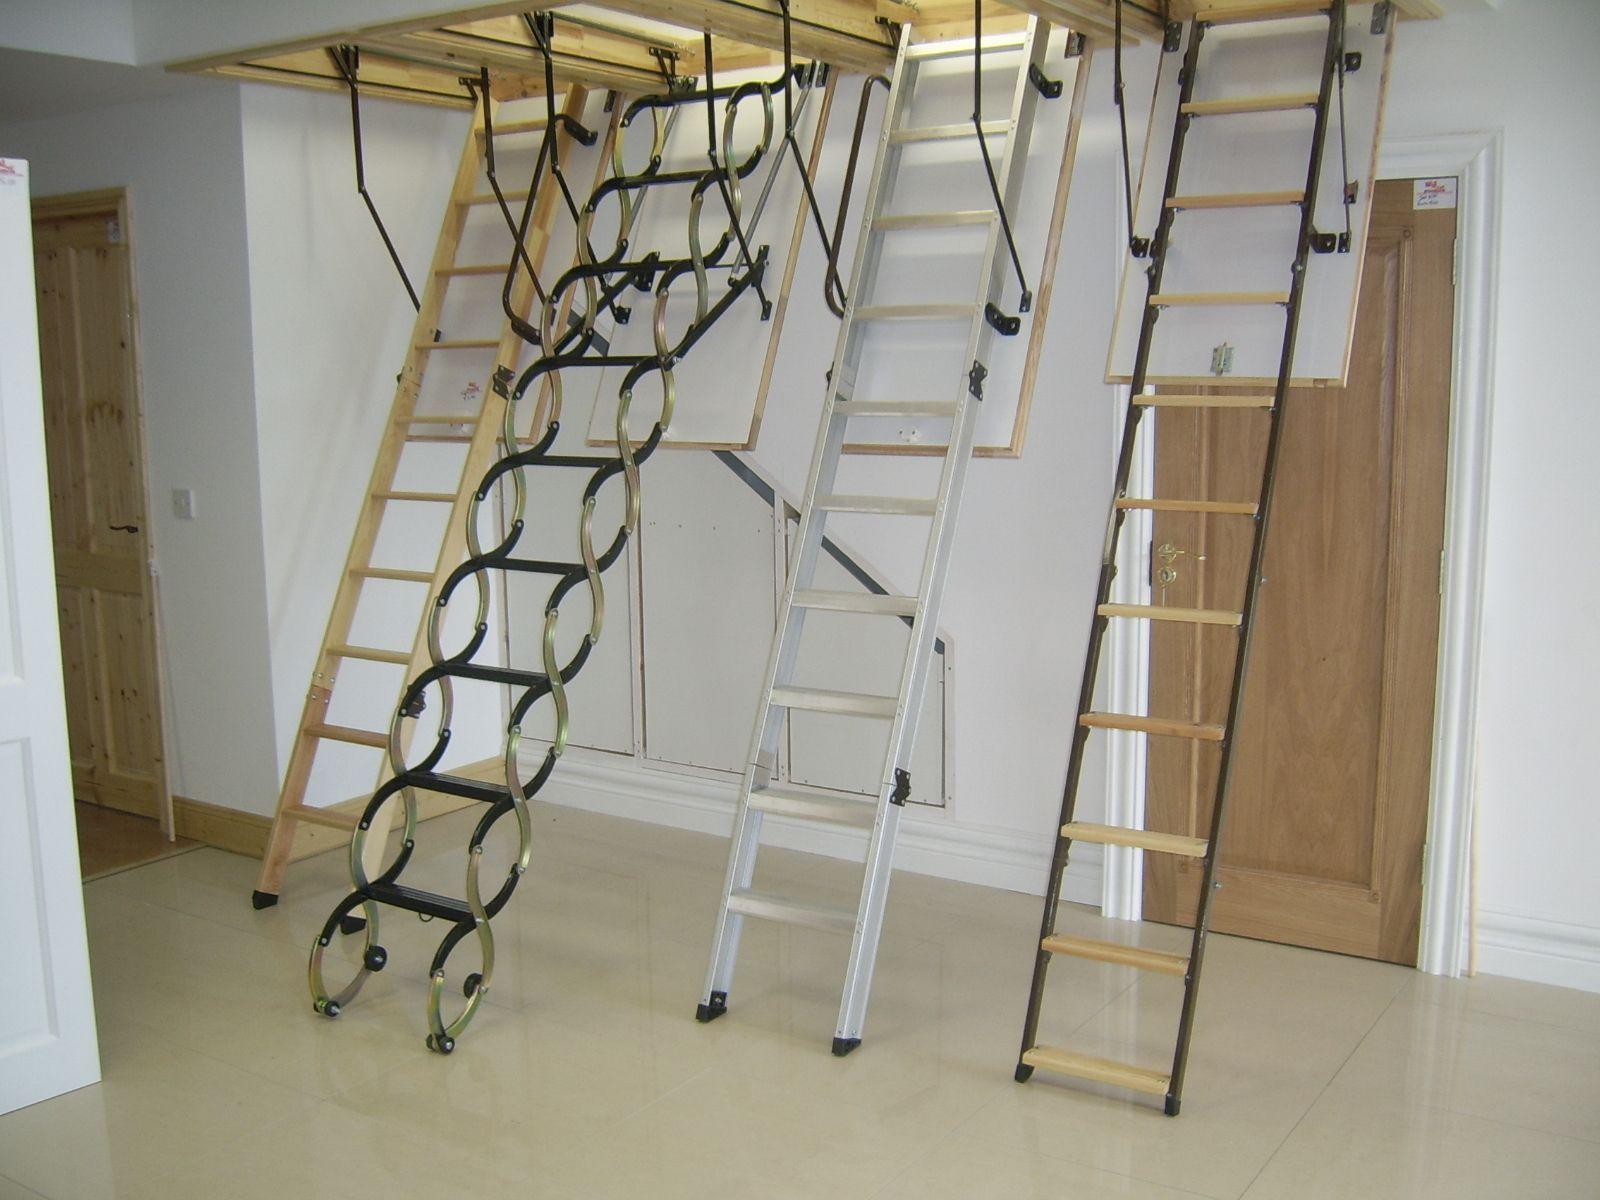 Amazing Tips Attic Dark Subway Tiles Attic Shelves Stairways Attic Renovation Tips Attic Skylight Stars Attic Works Attic Ladder Attic Stairs Attic Renovation